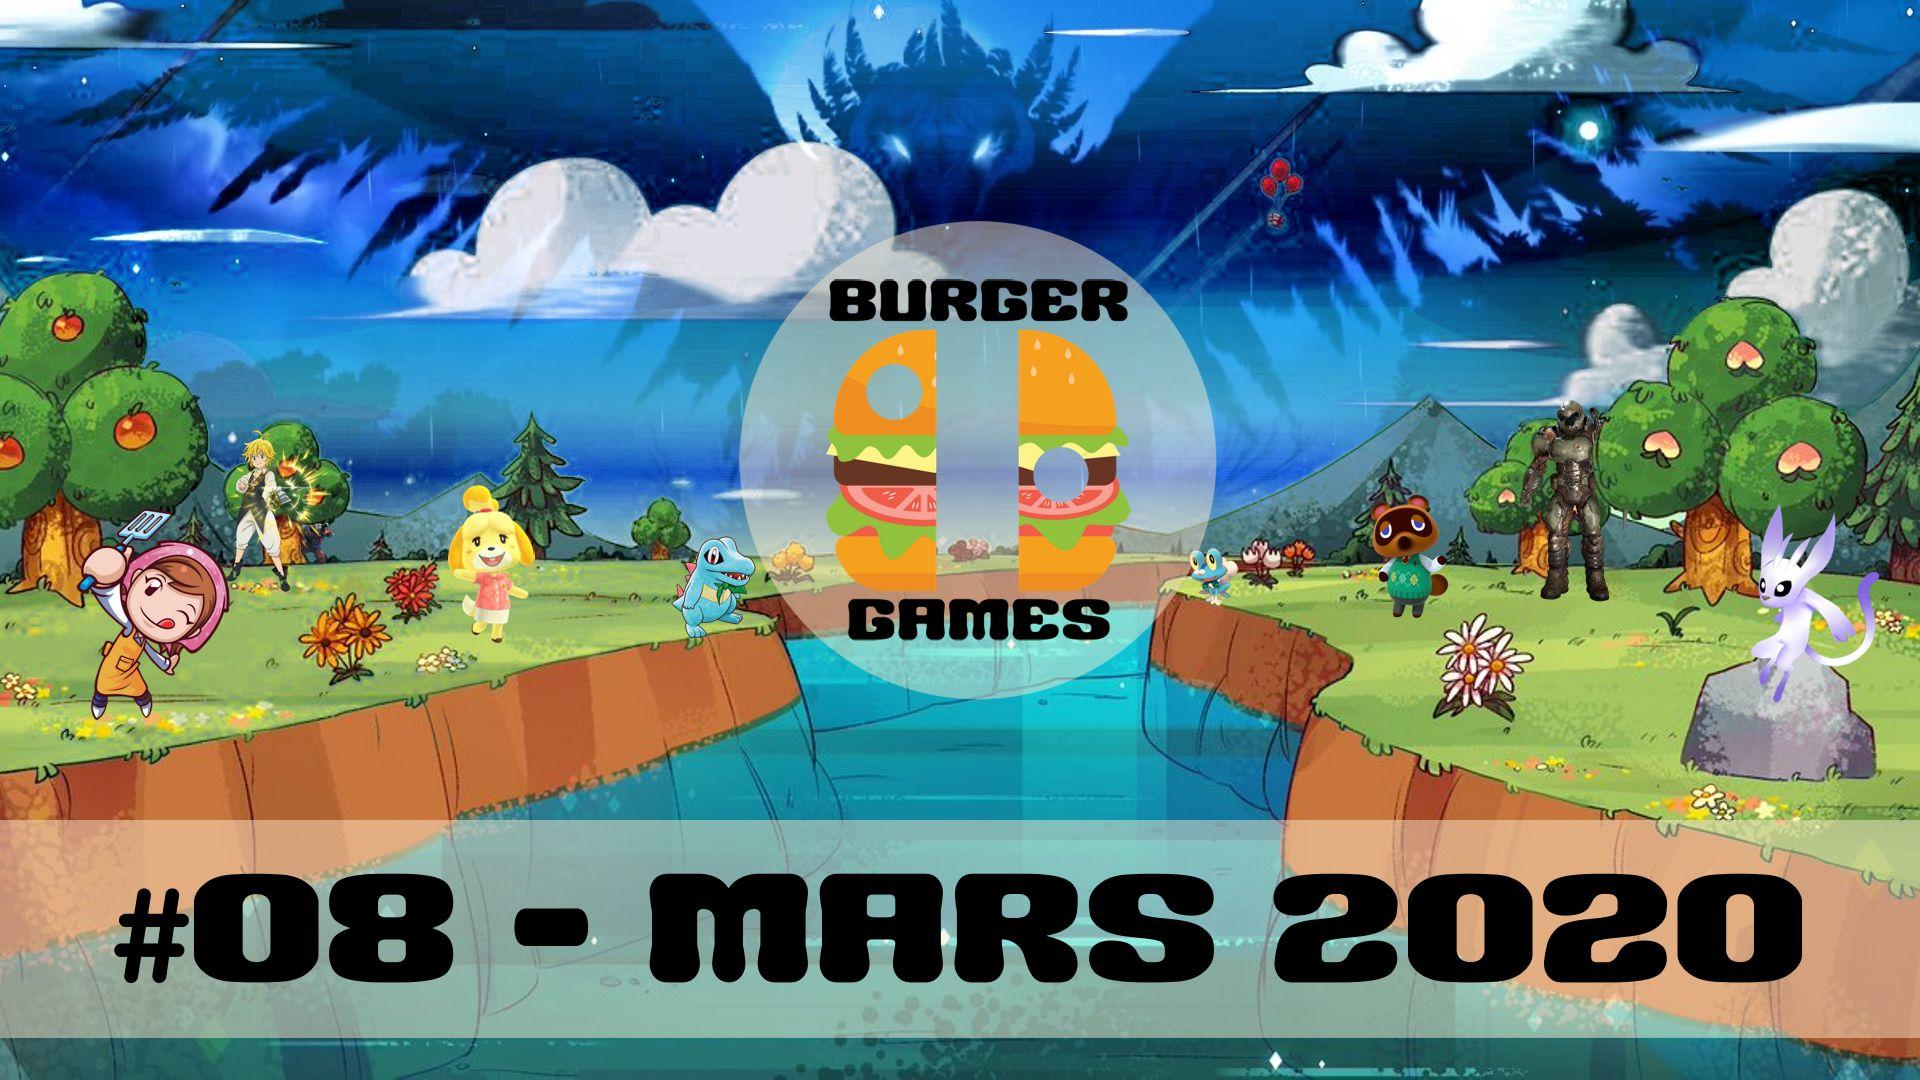 Burger Games - 08